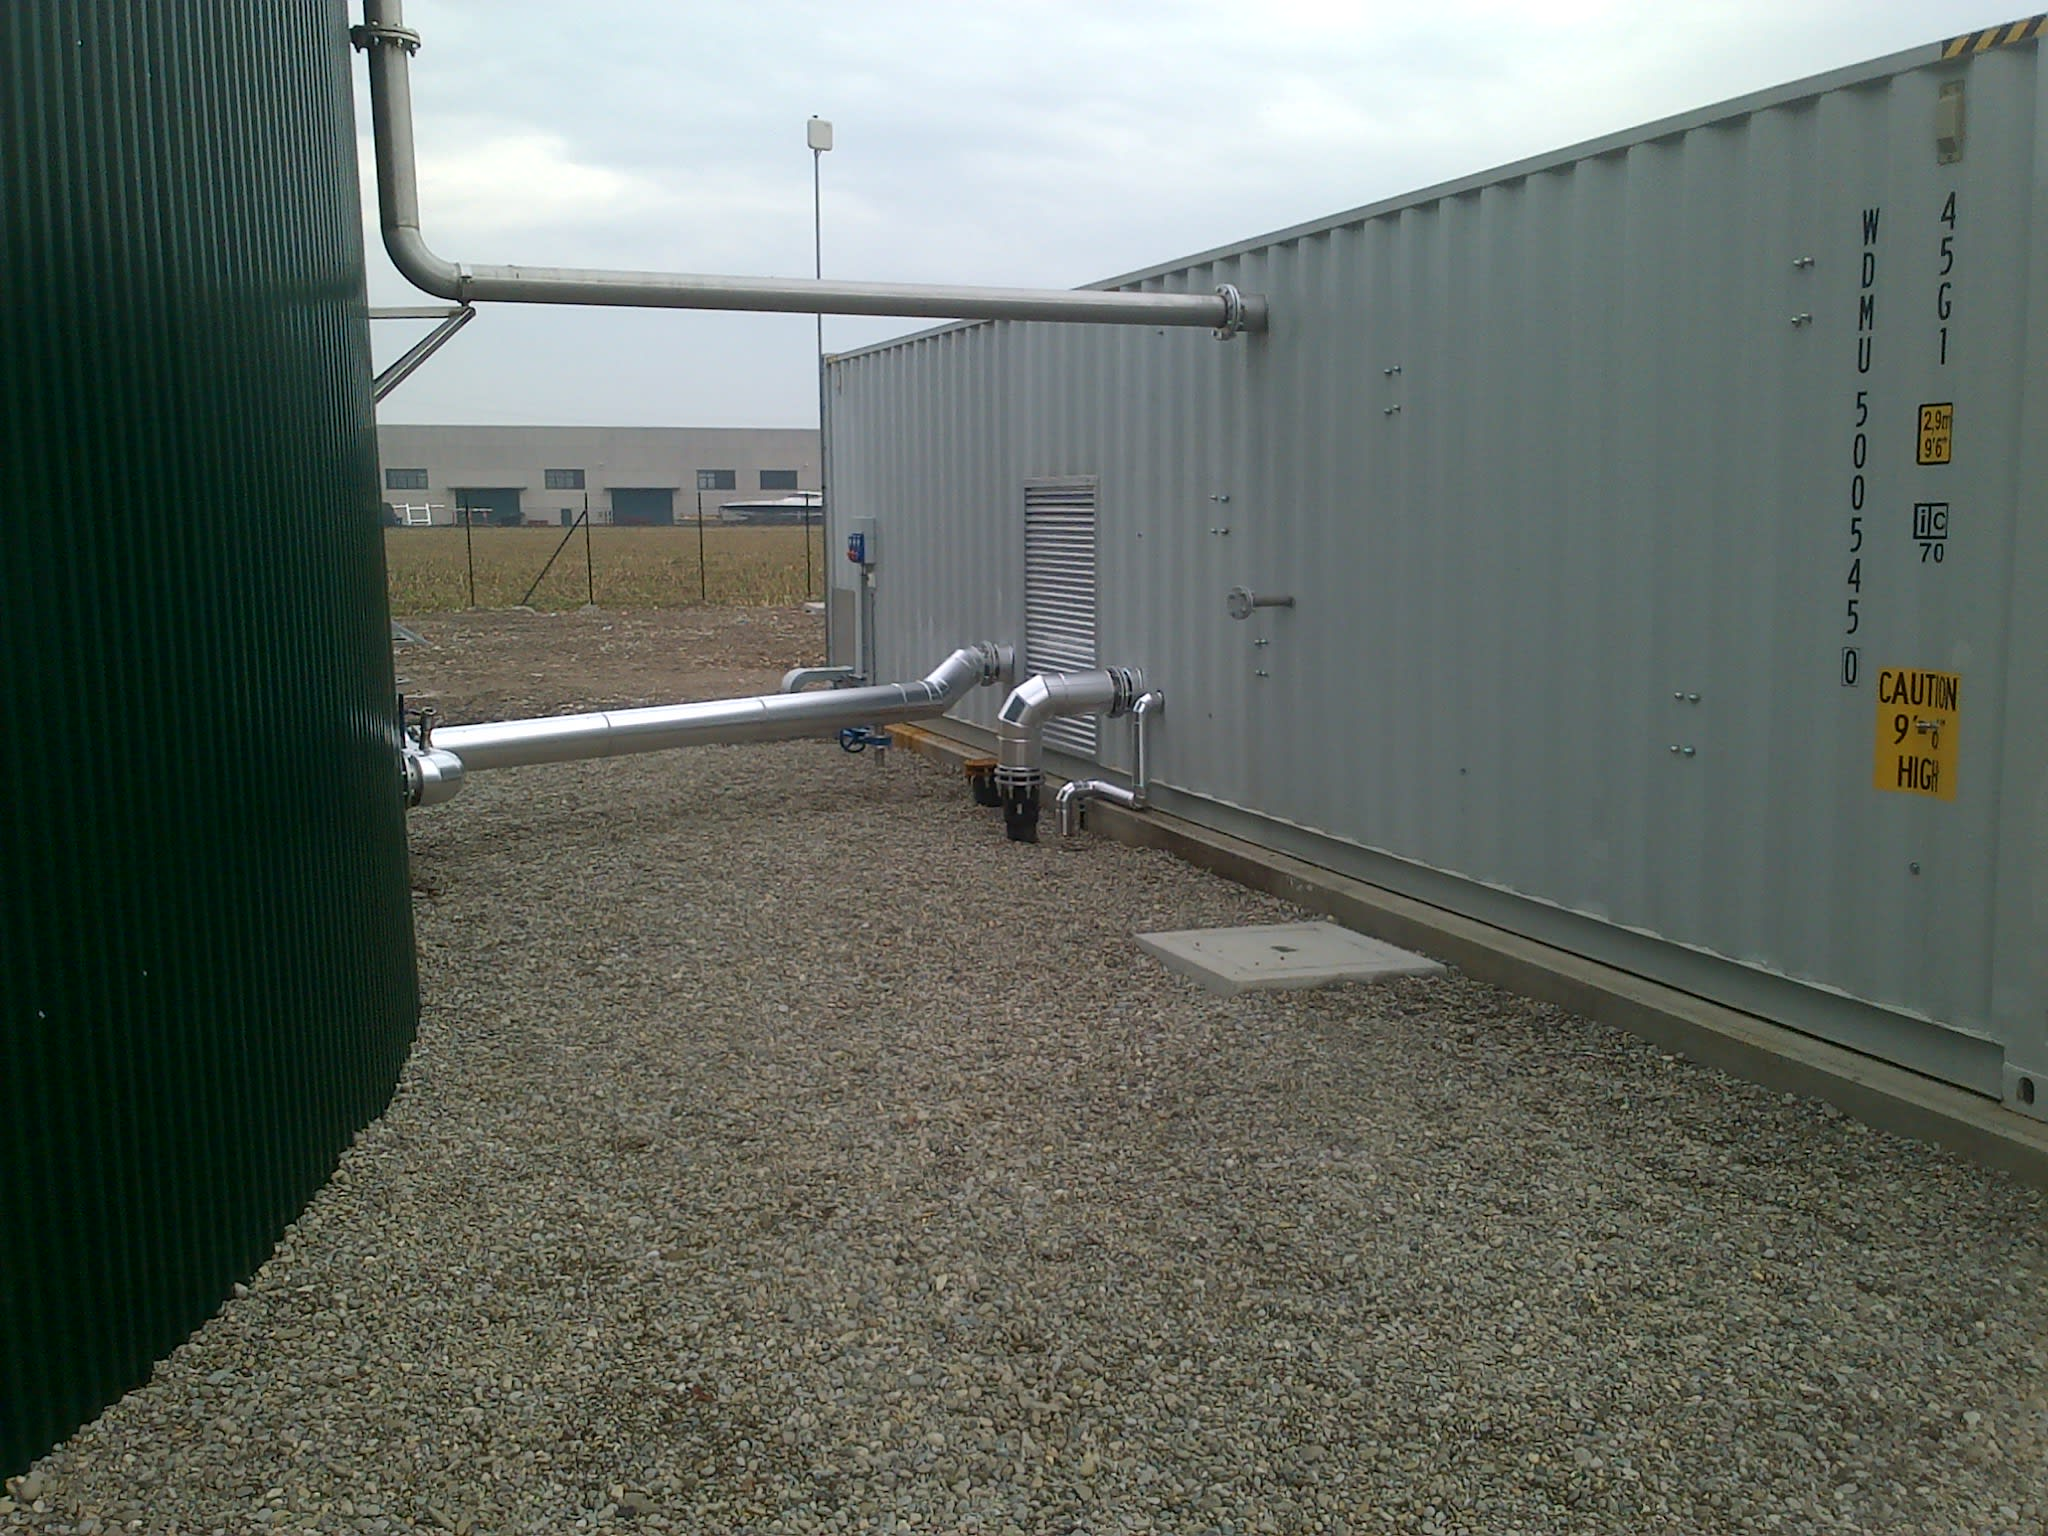 produzione biometano da biogas